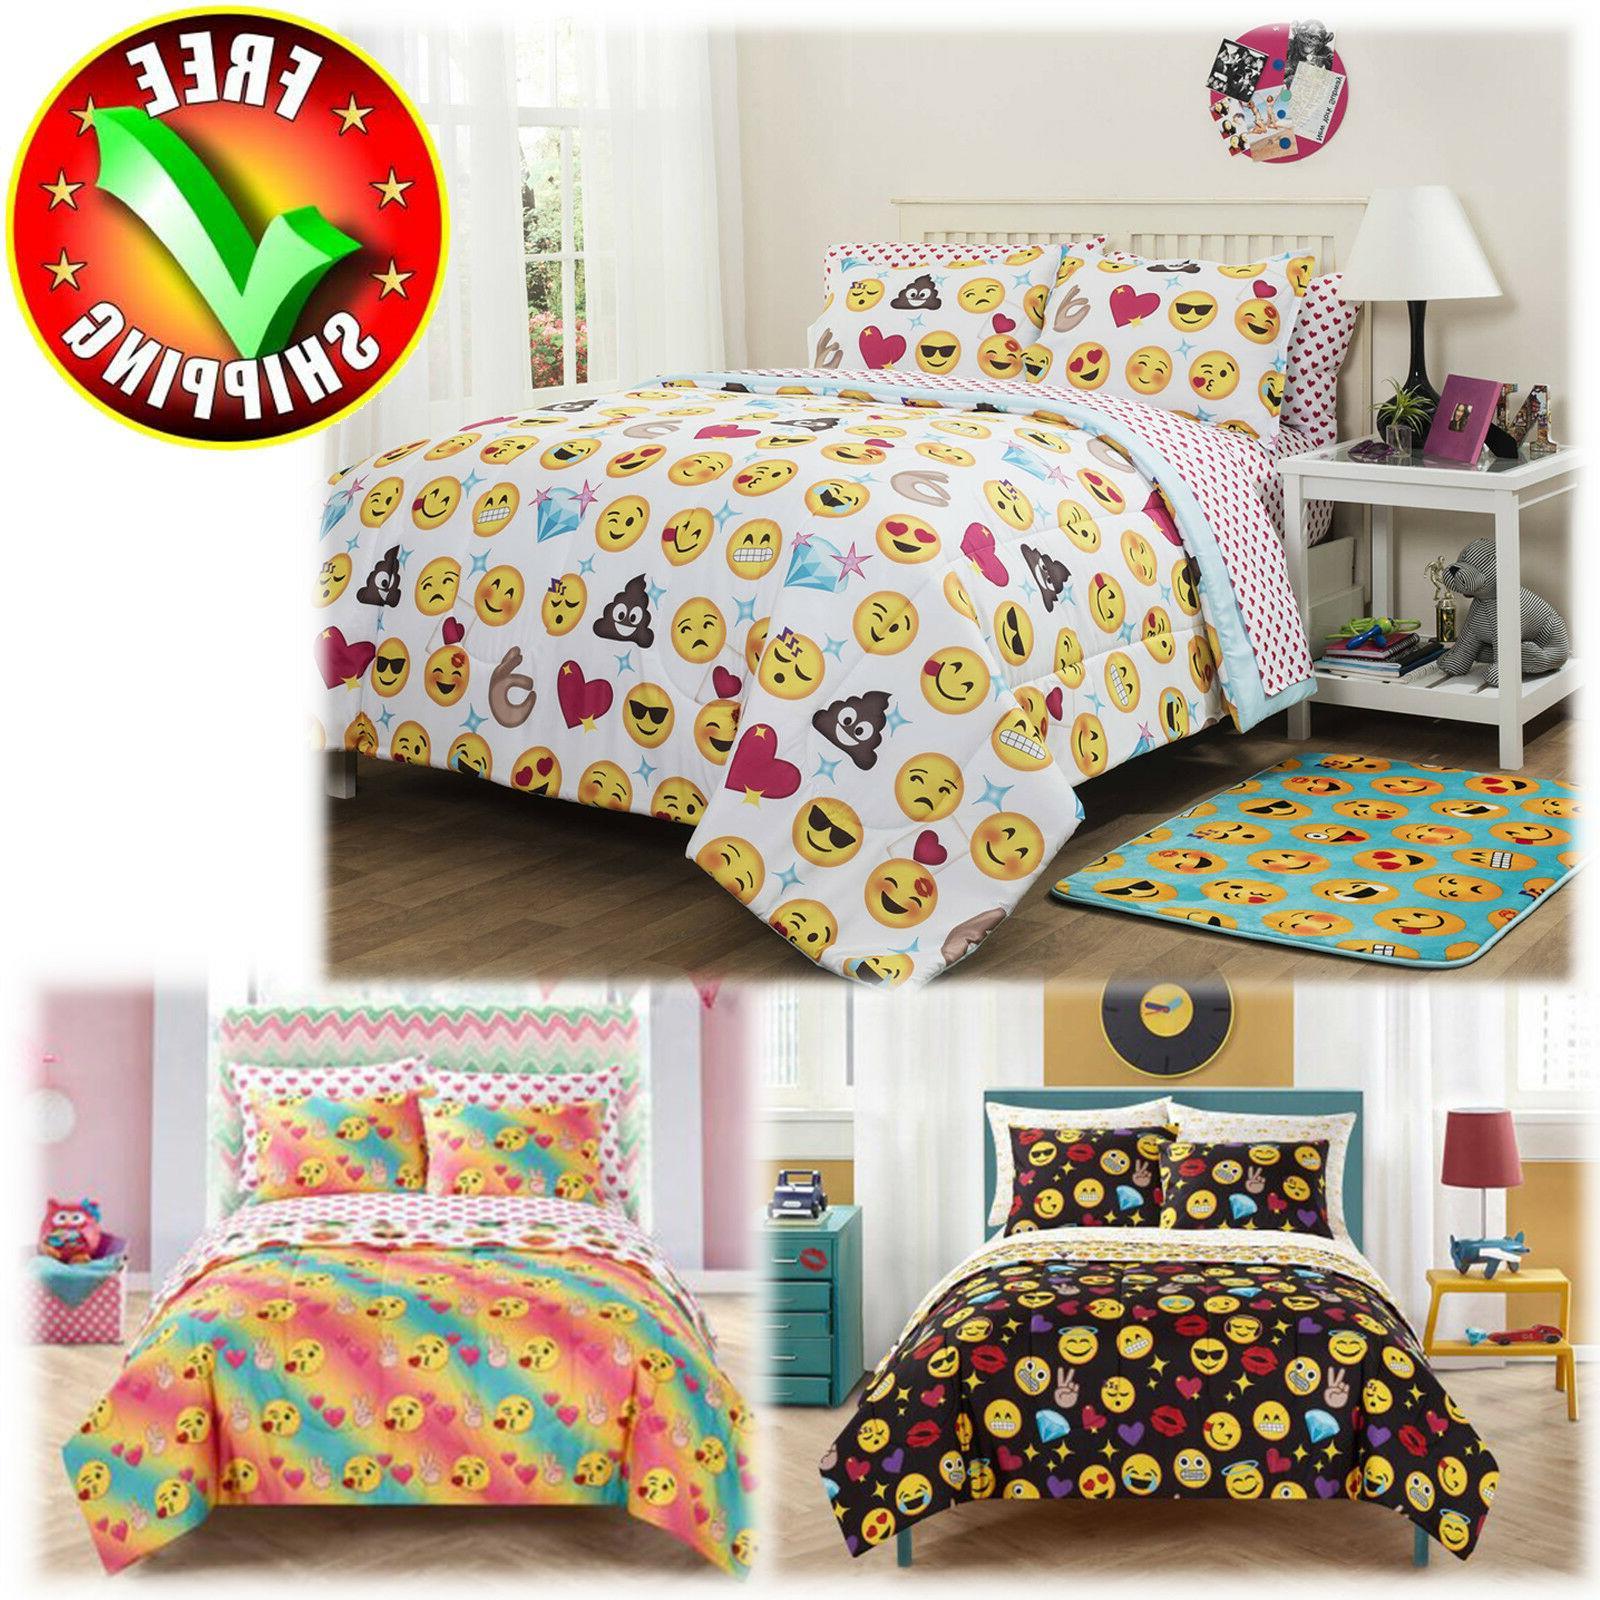 Bedding Sheet  Set Comforter Queen Twin Full Girls Boys Reve